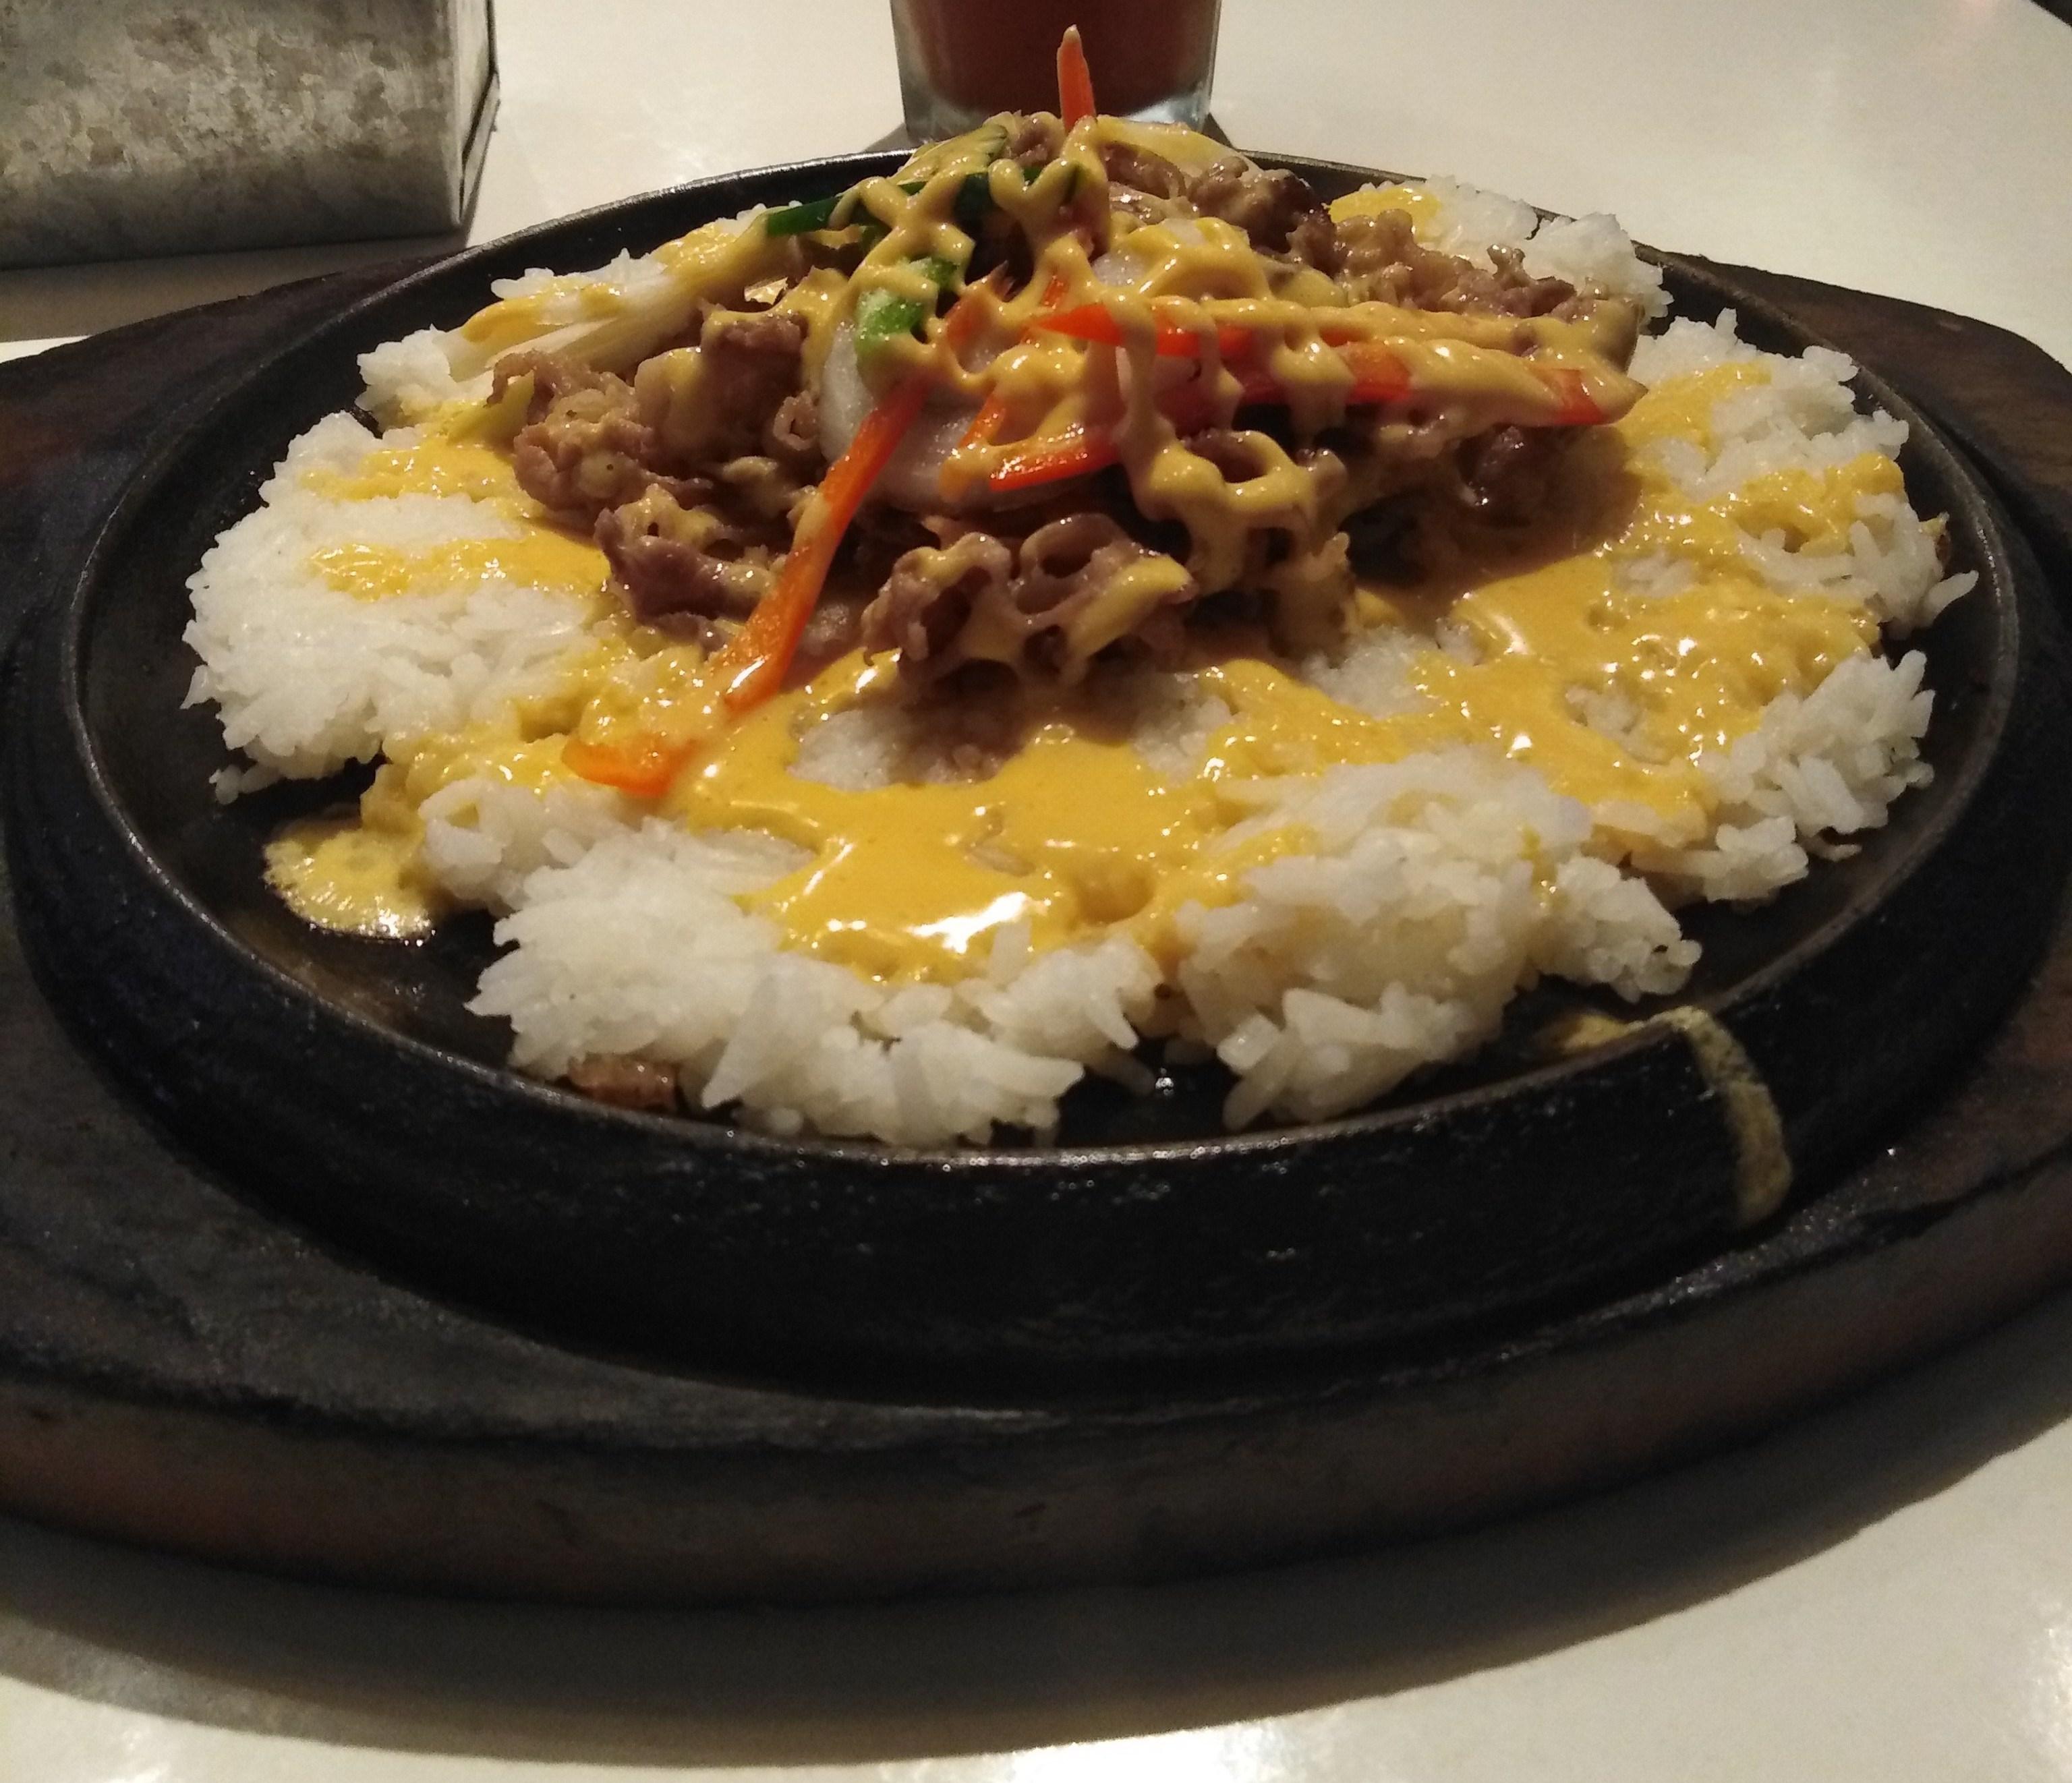 Cheesy Beef Rice by Sizzlin' Steak